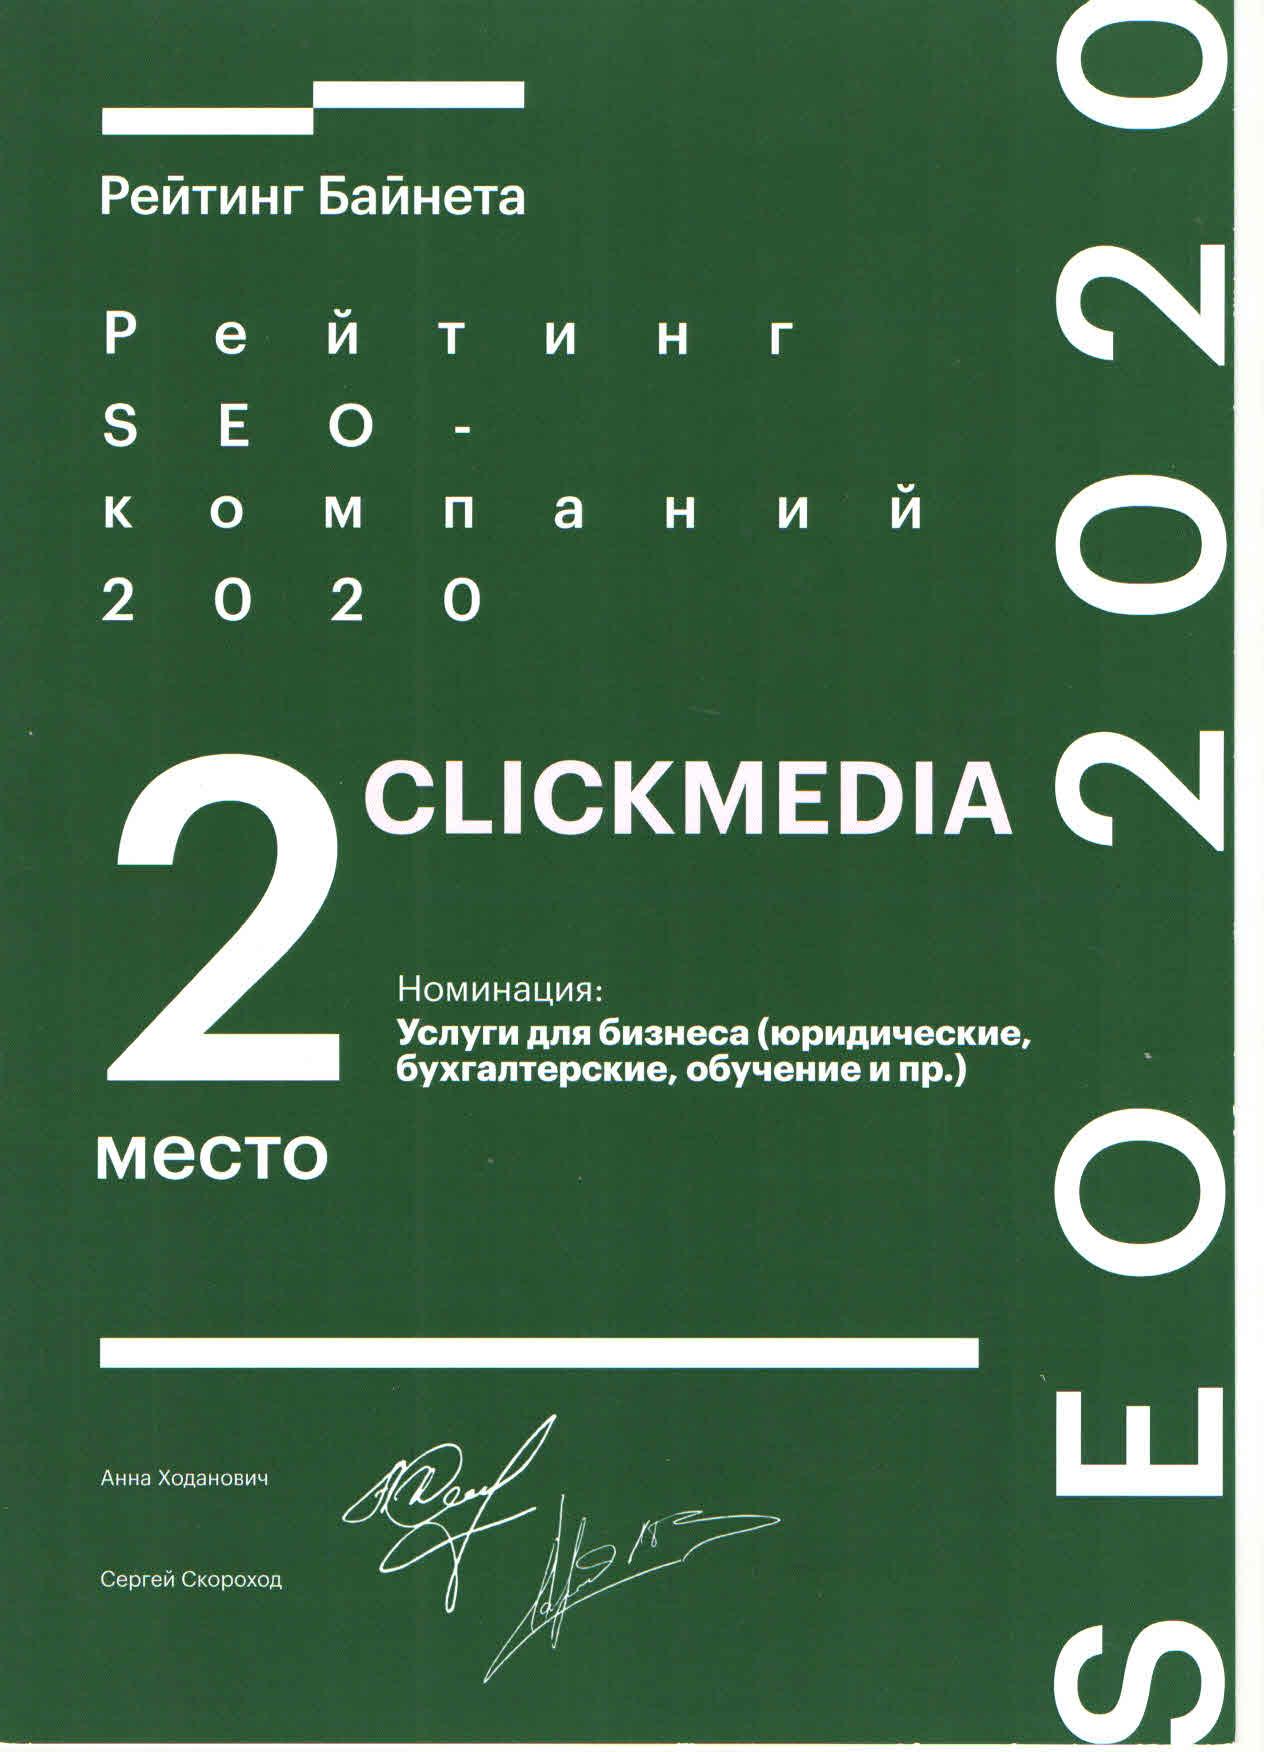 <b>2-е место</b> в рейтинге SEO-компаний Беларуси.<br>Номинация:<br><b>Услуги для бизнеса: юридические, бухгалтерские, обучение</b>